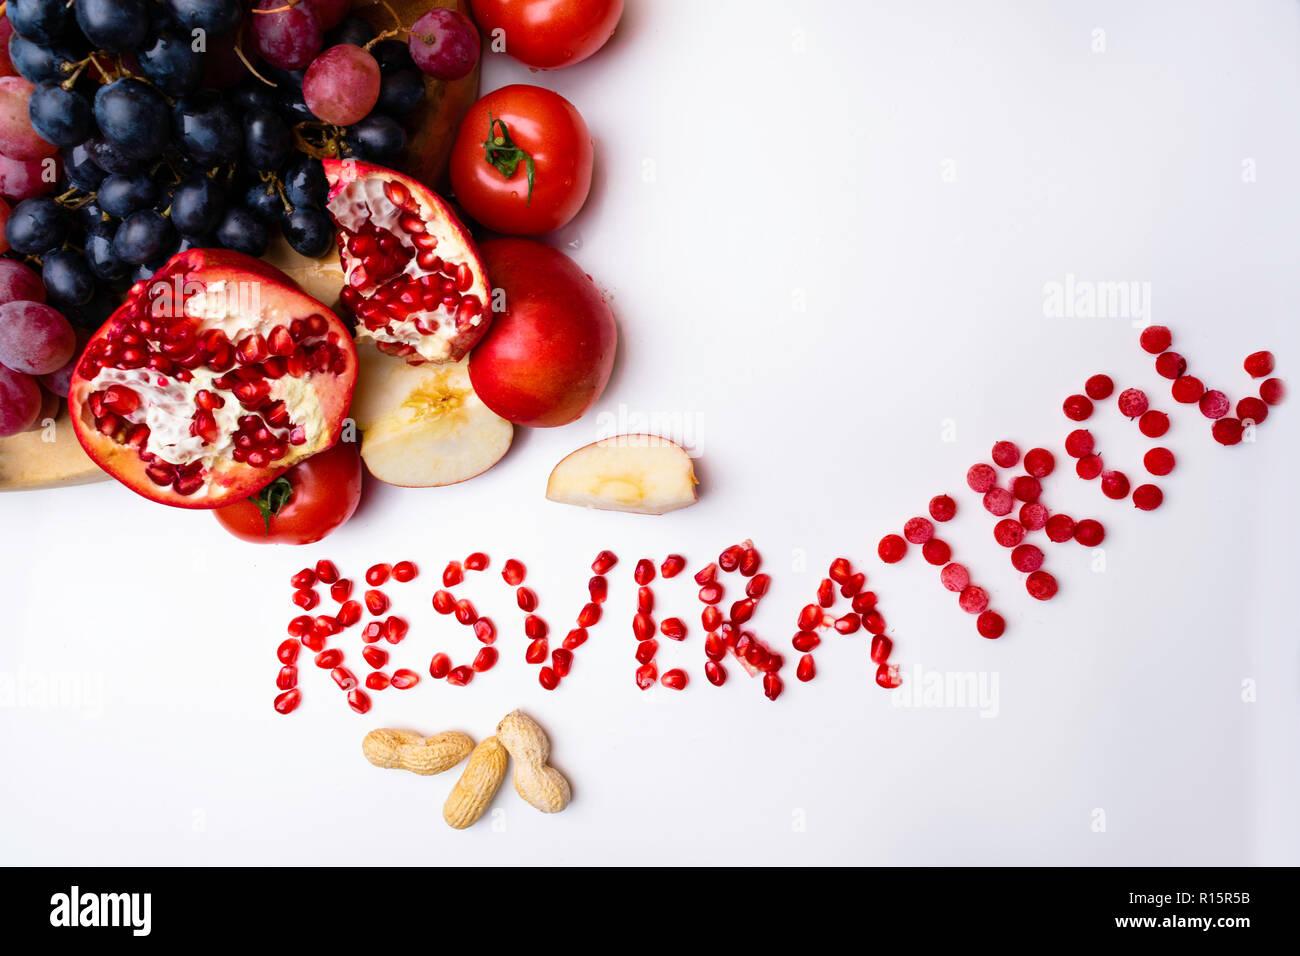 Rich With Resveratrol Food Raw Food Ingredients Nutrition